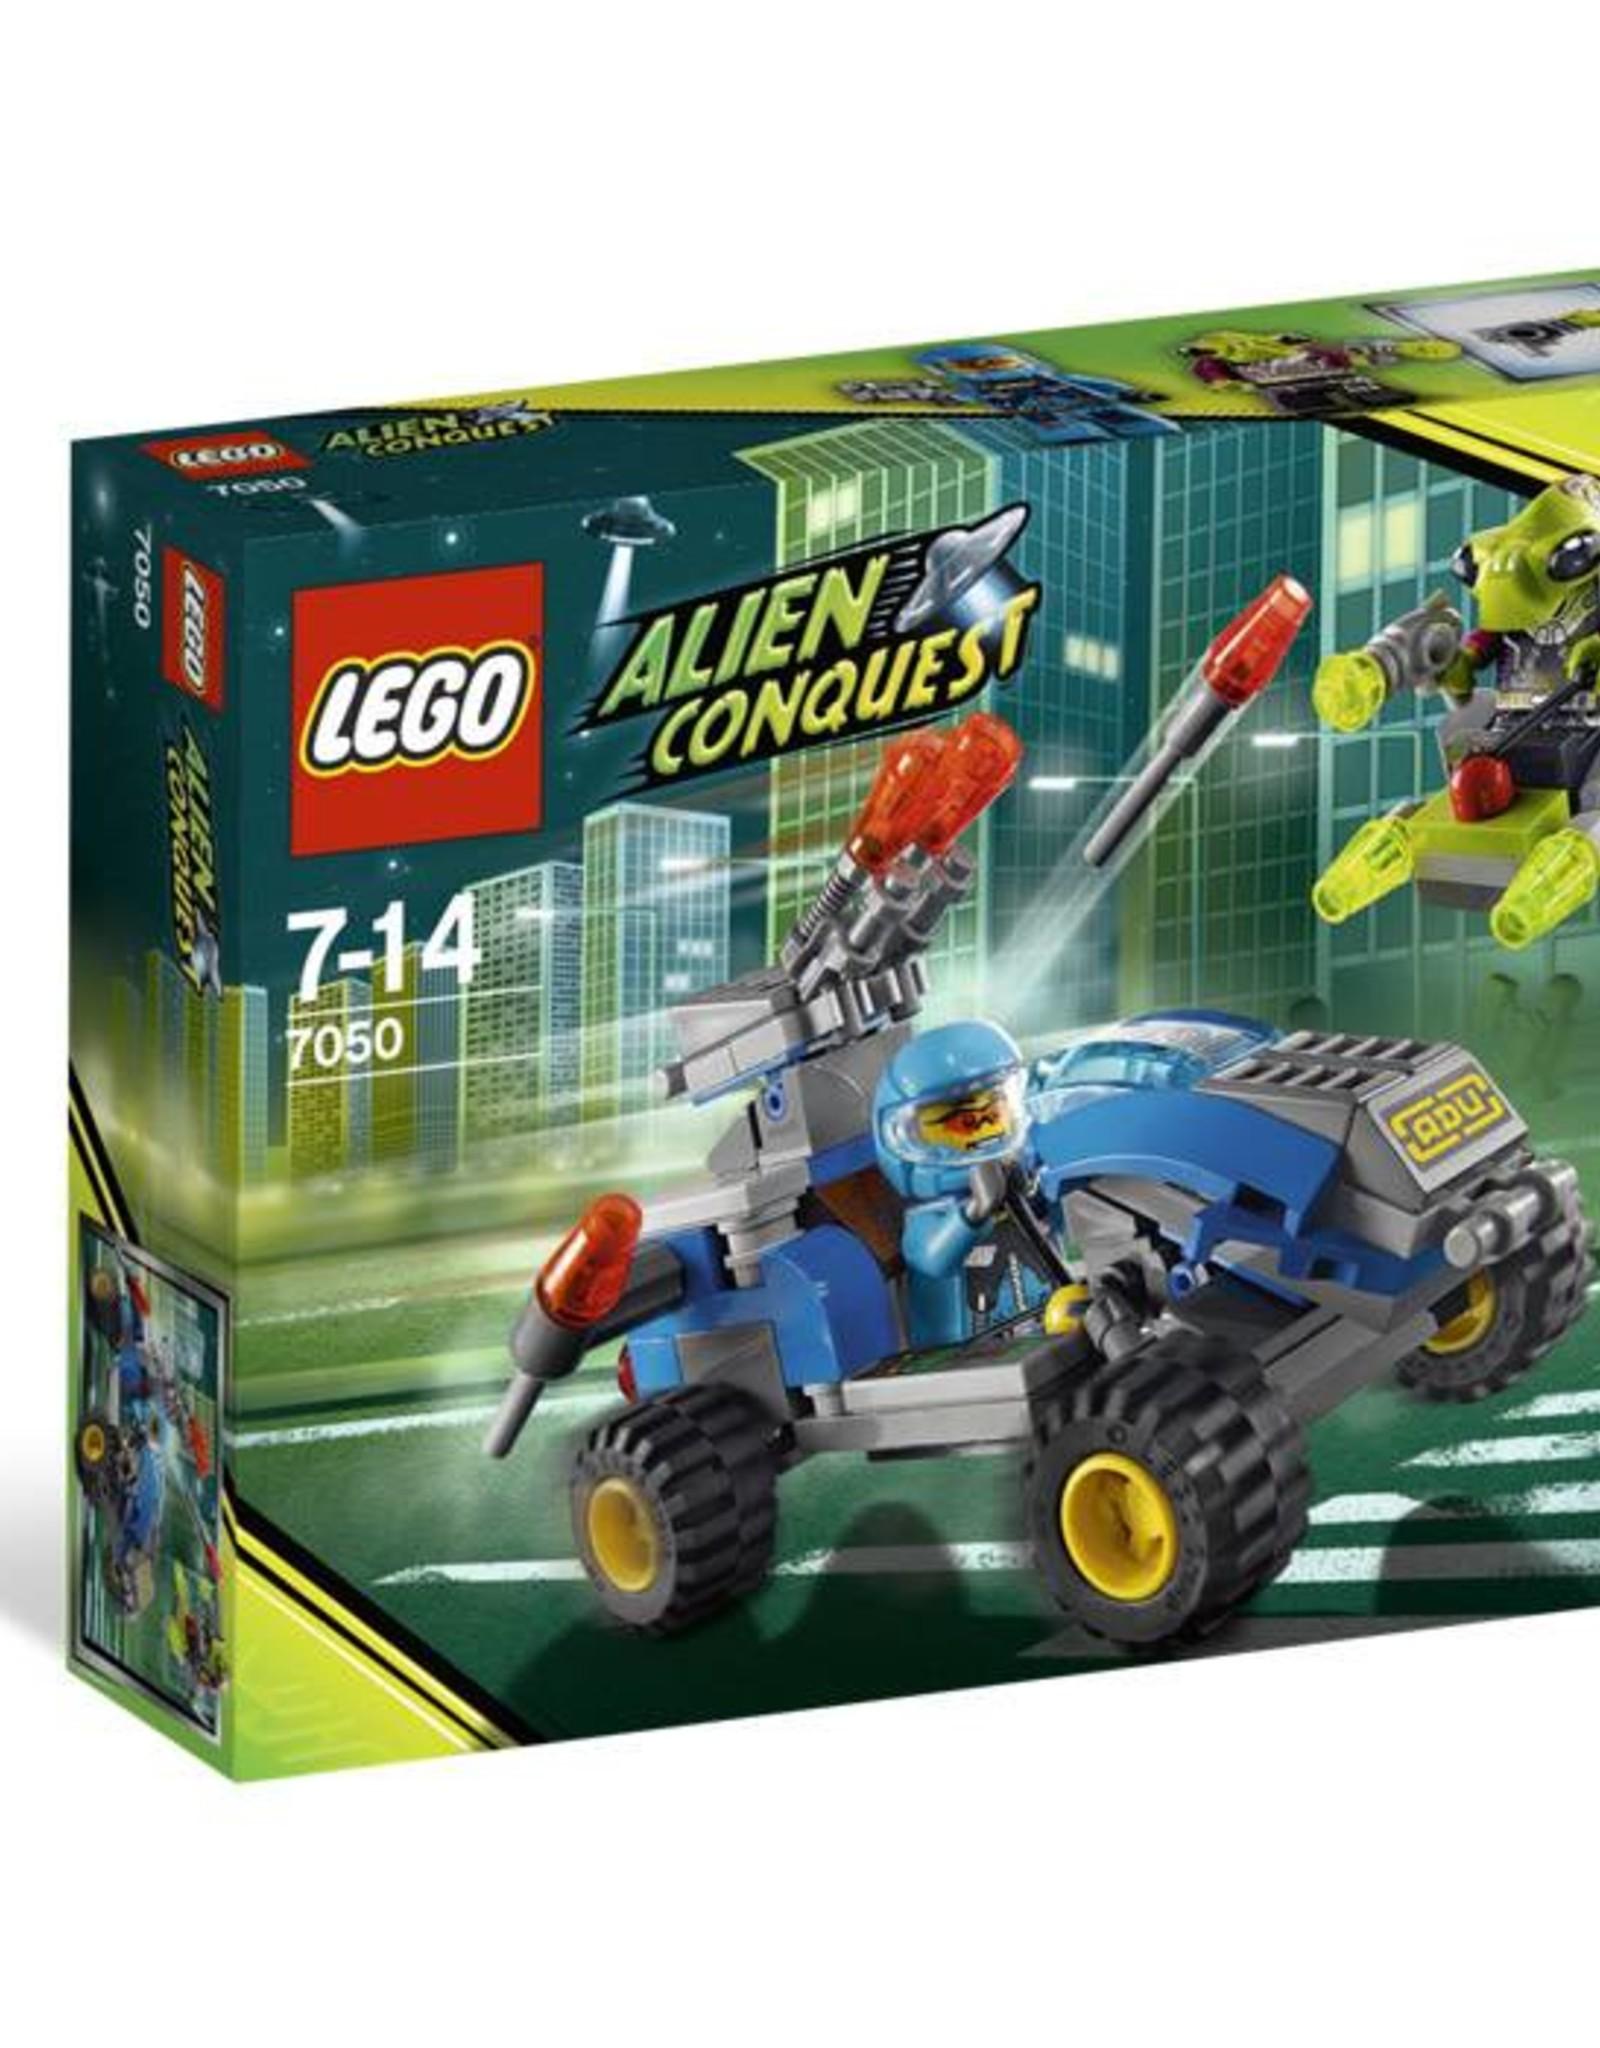 LEGO LEGO 7050 Alien Defender ALIEN CONQUEST